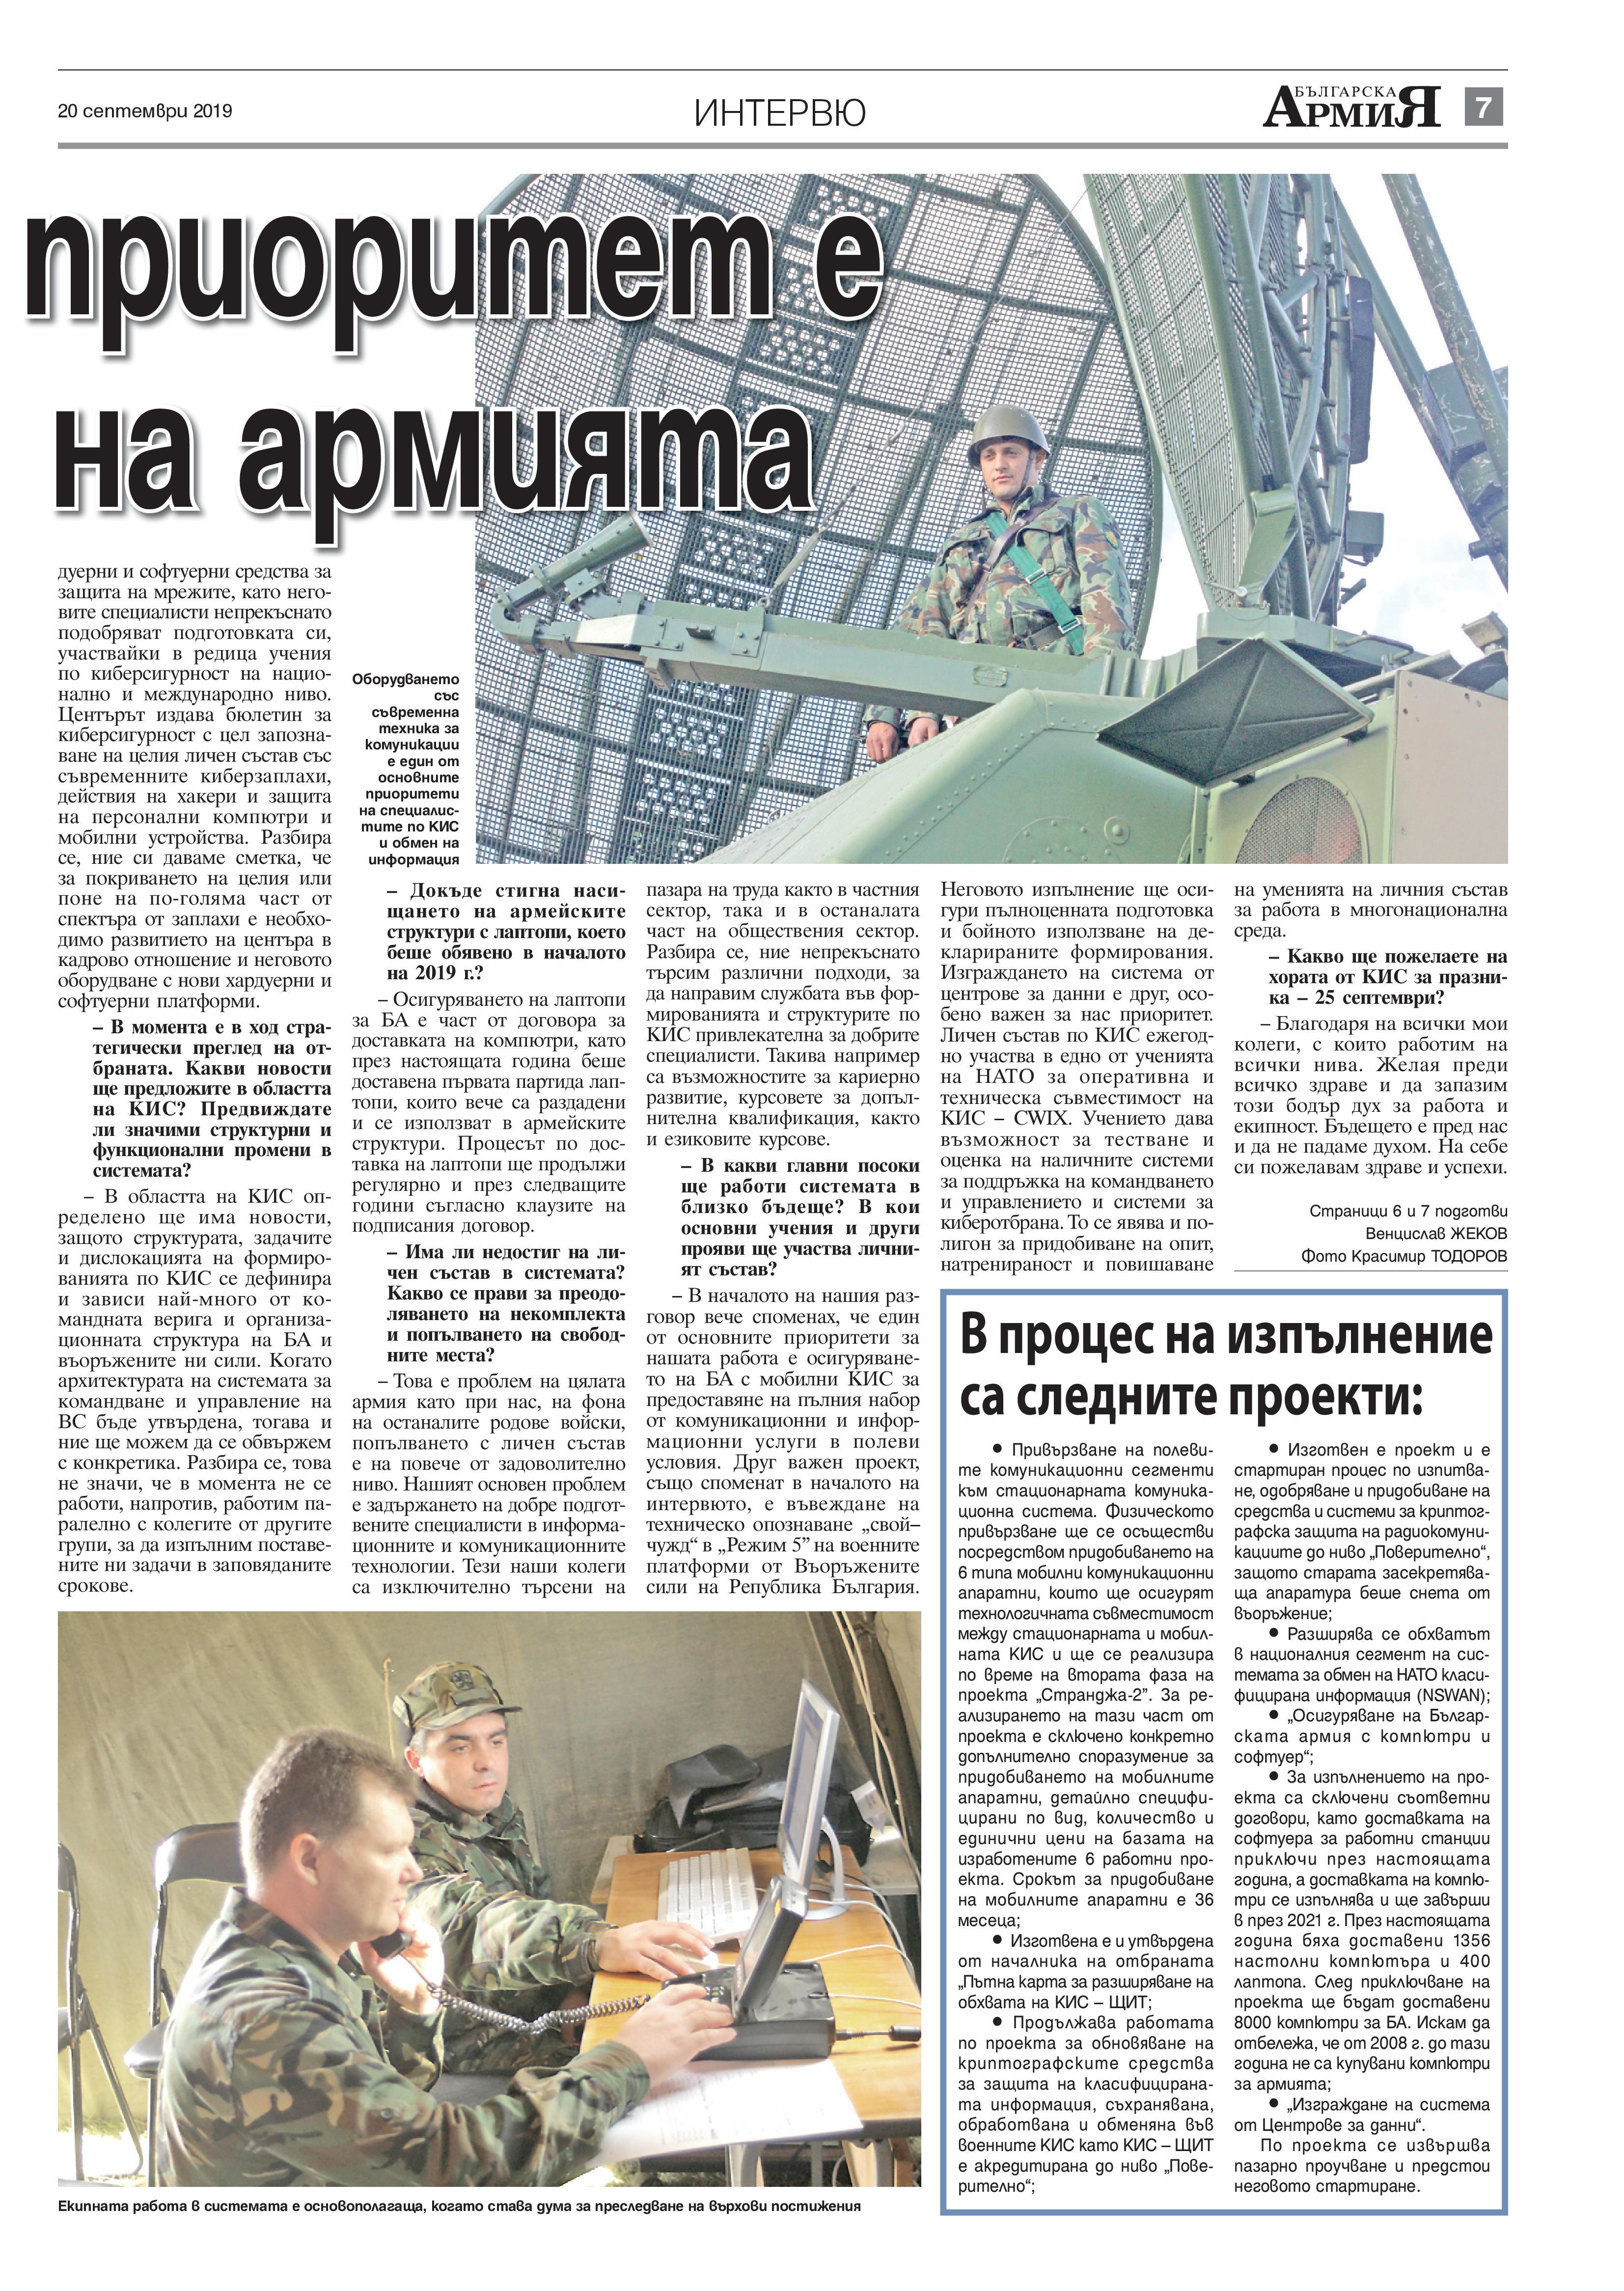 https://www.armymedia.bg/wp-content/uploads/2015/06/07-31.jpg